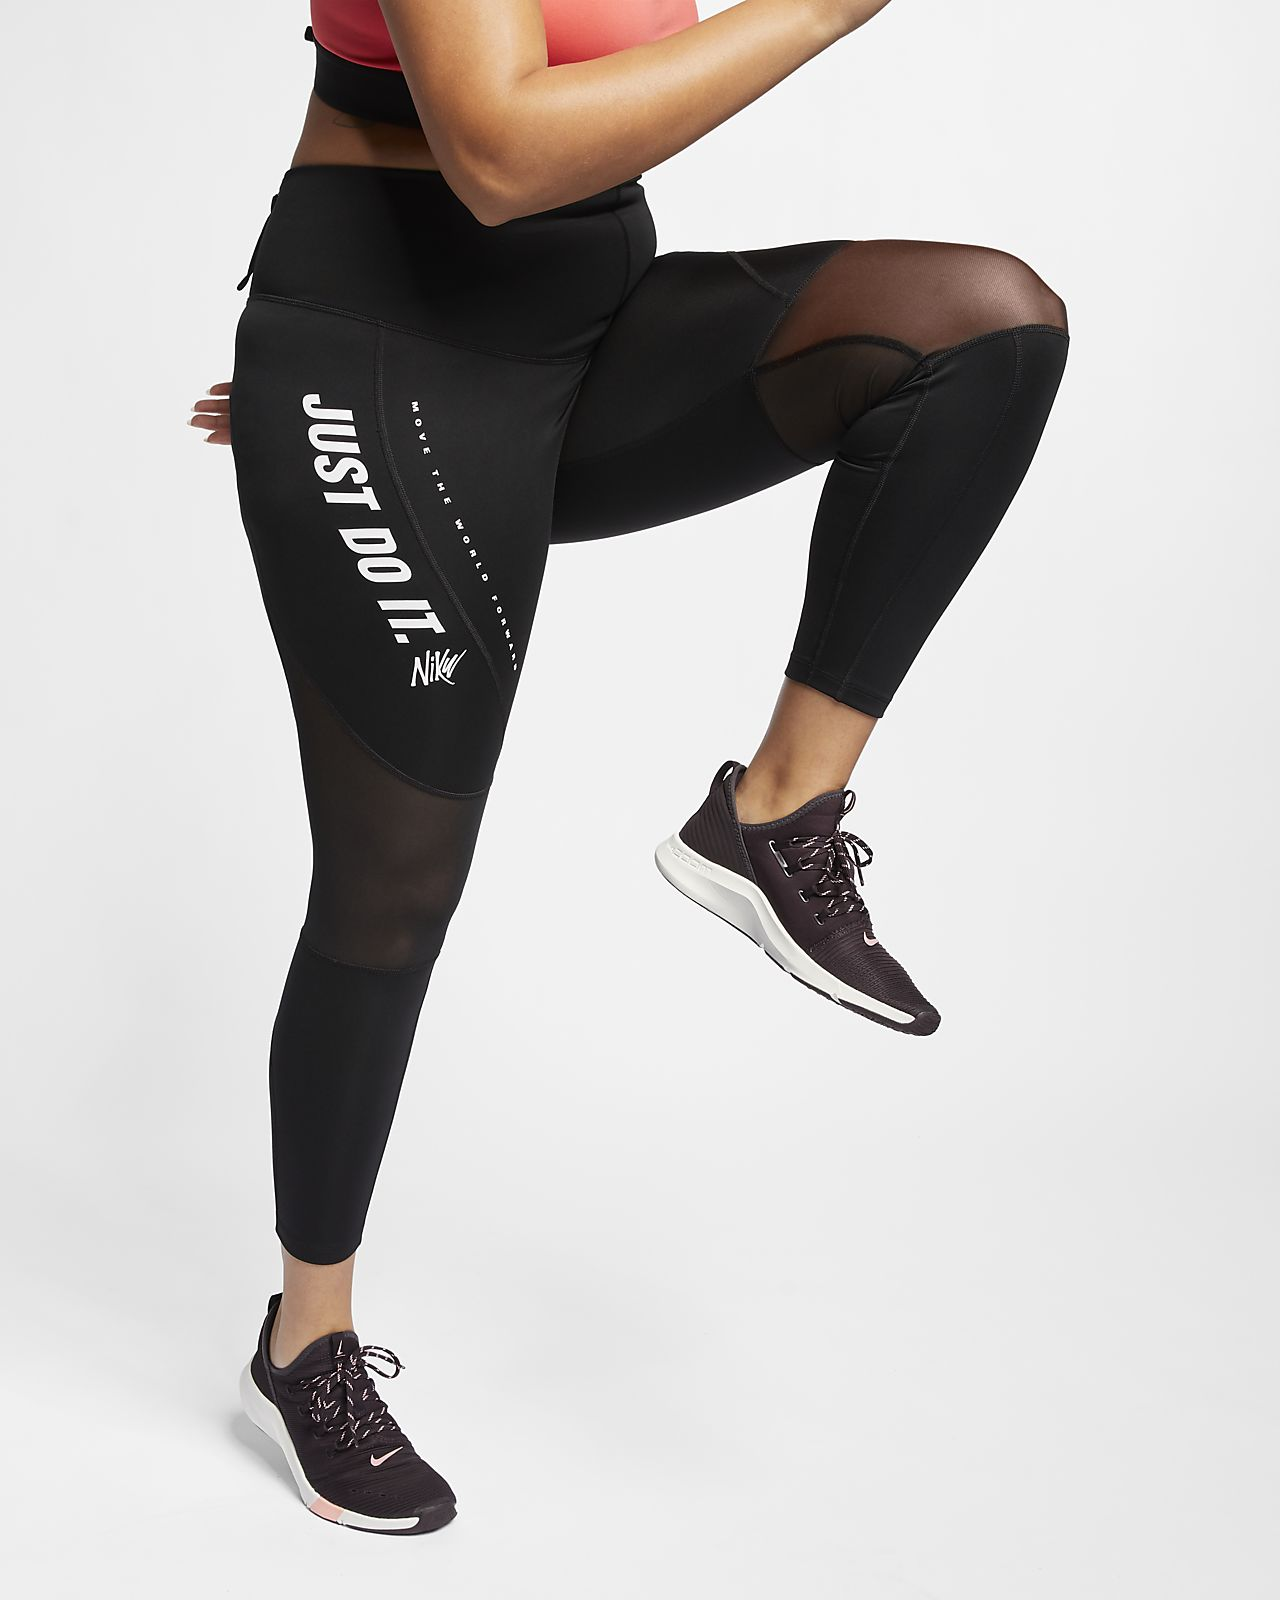 Nike Power Malles d'entrenament (talles grans) - Dona